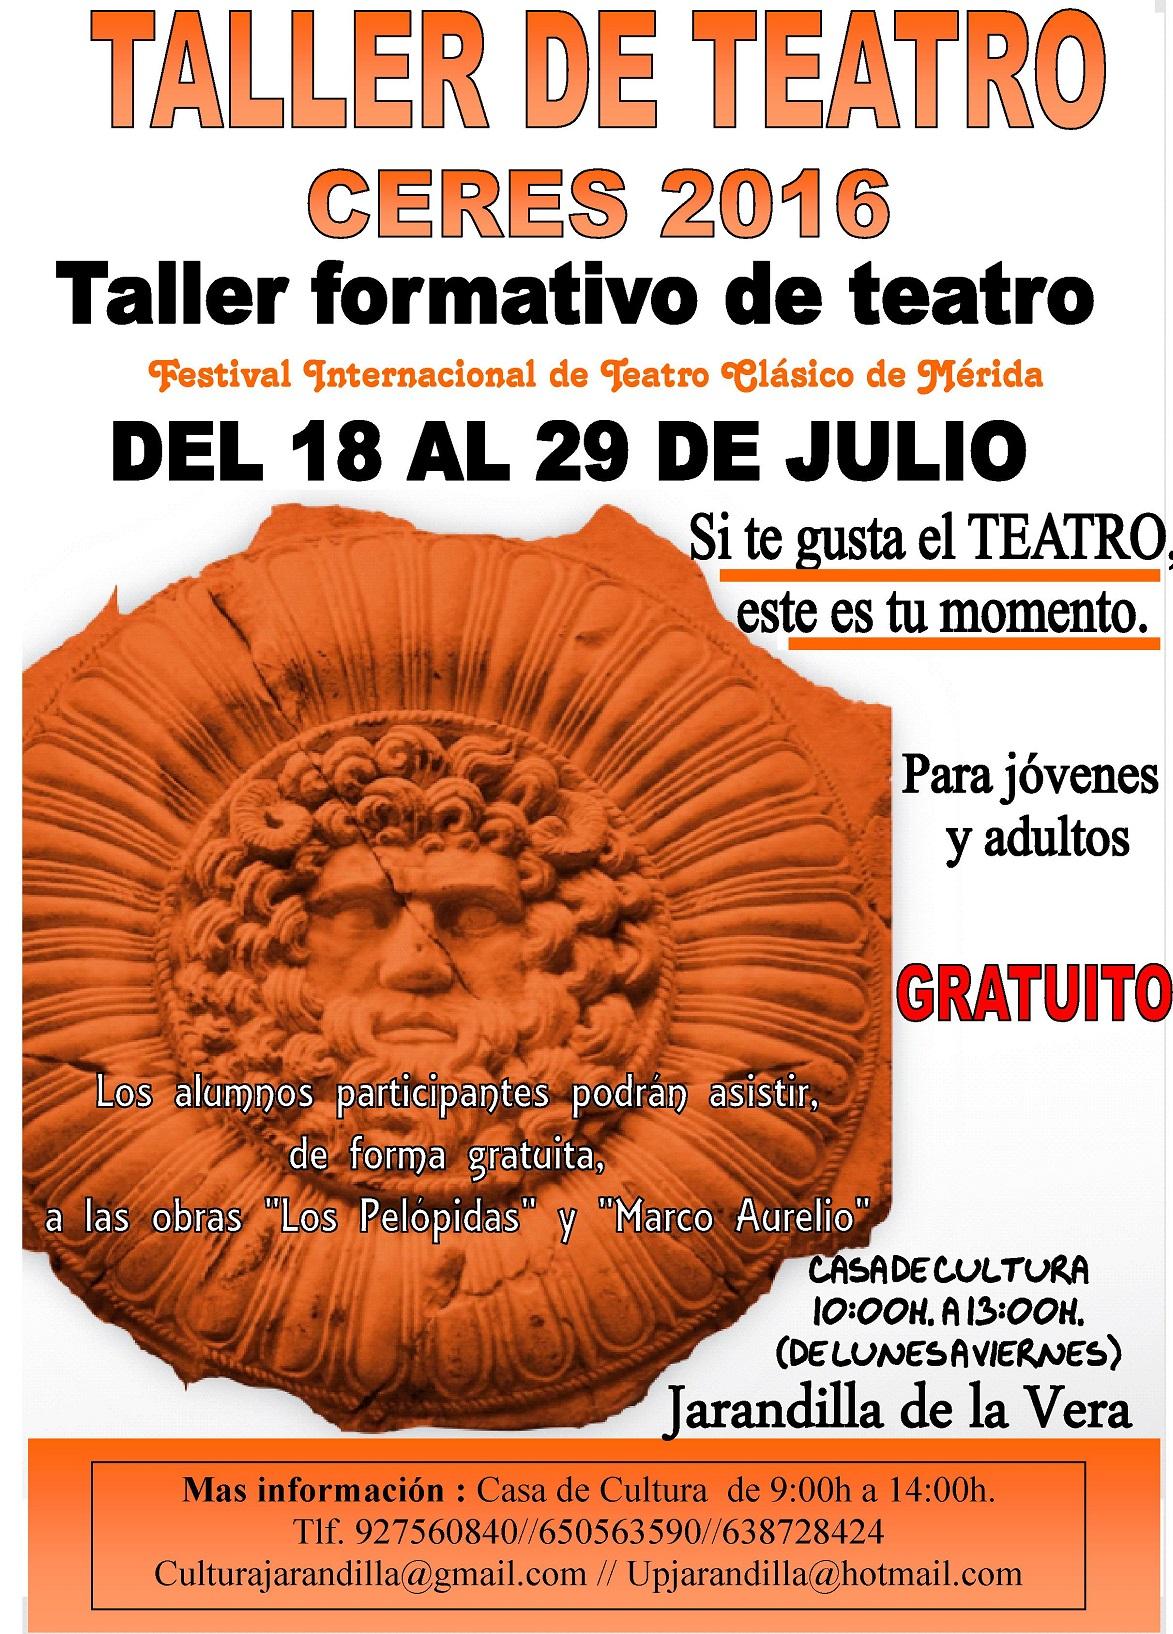 TALLER DE TEATRO CERES